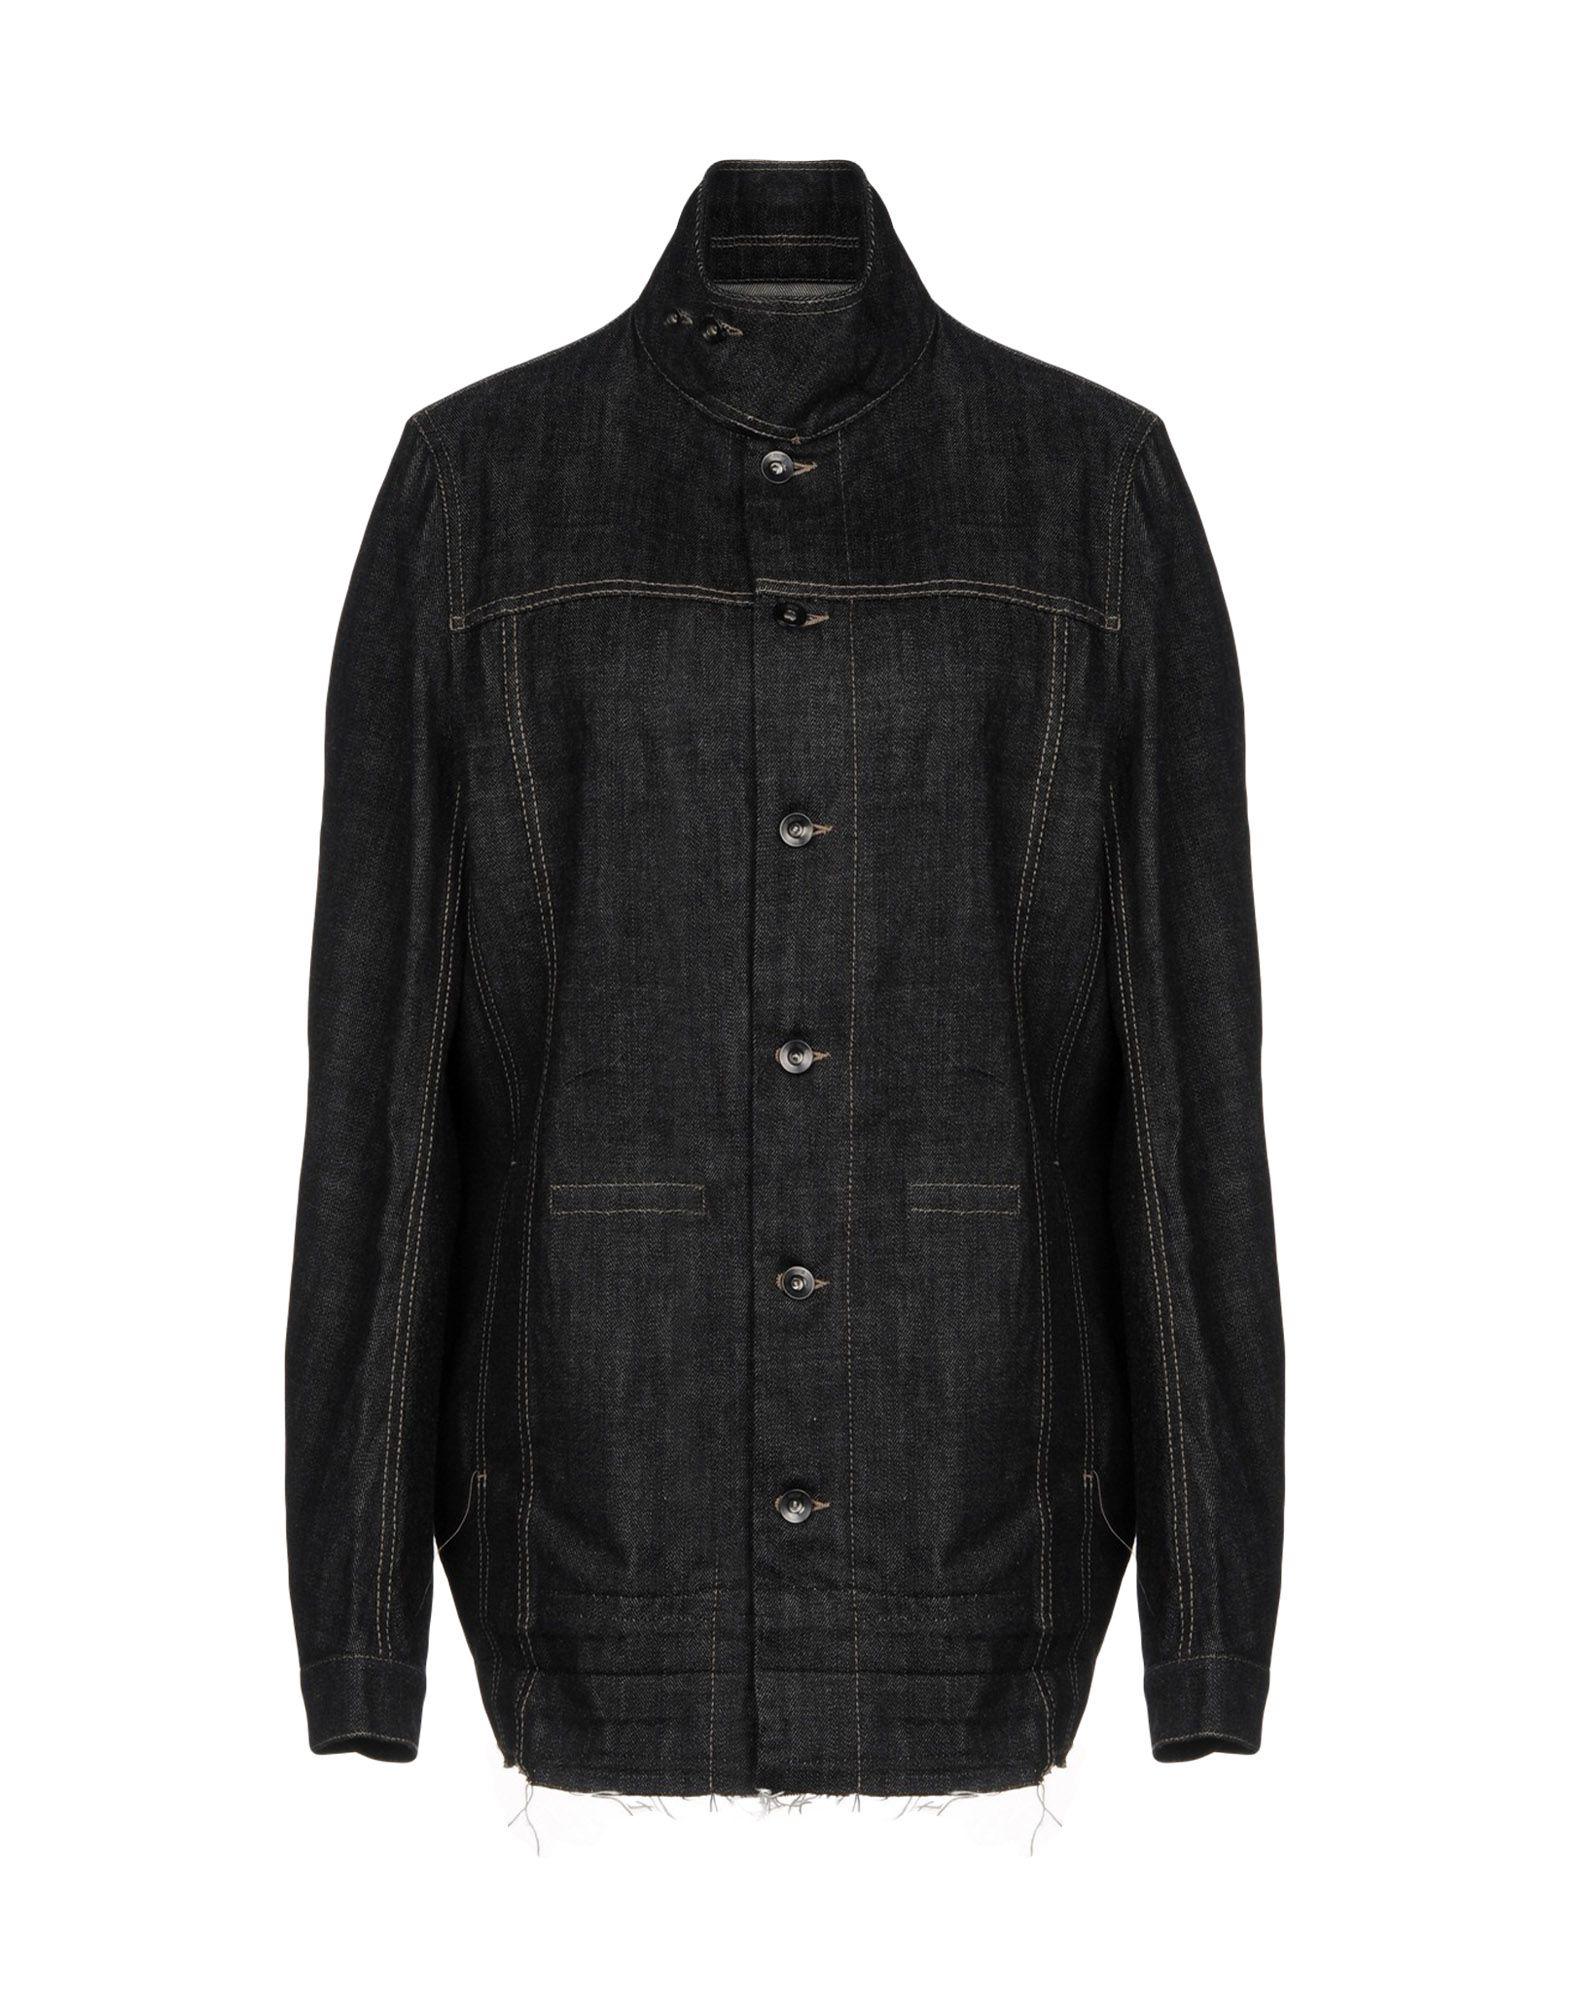 DRKSHDW by RICK OWENS Джинсовая верхняя одежда пуловер quelle rick cardona by heine 66328